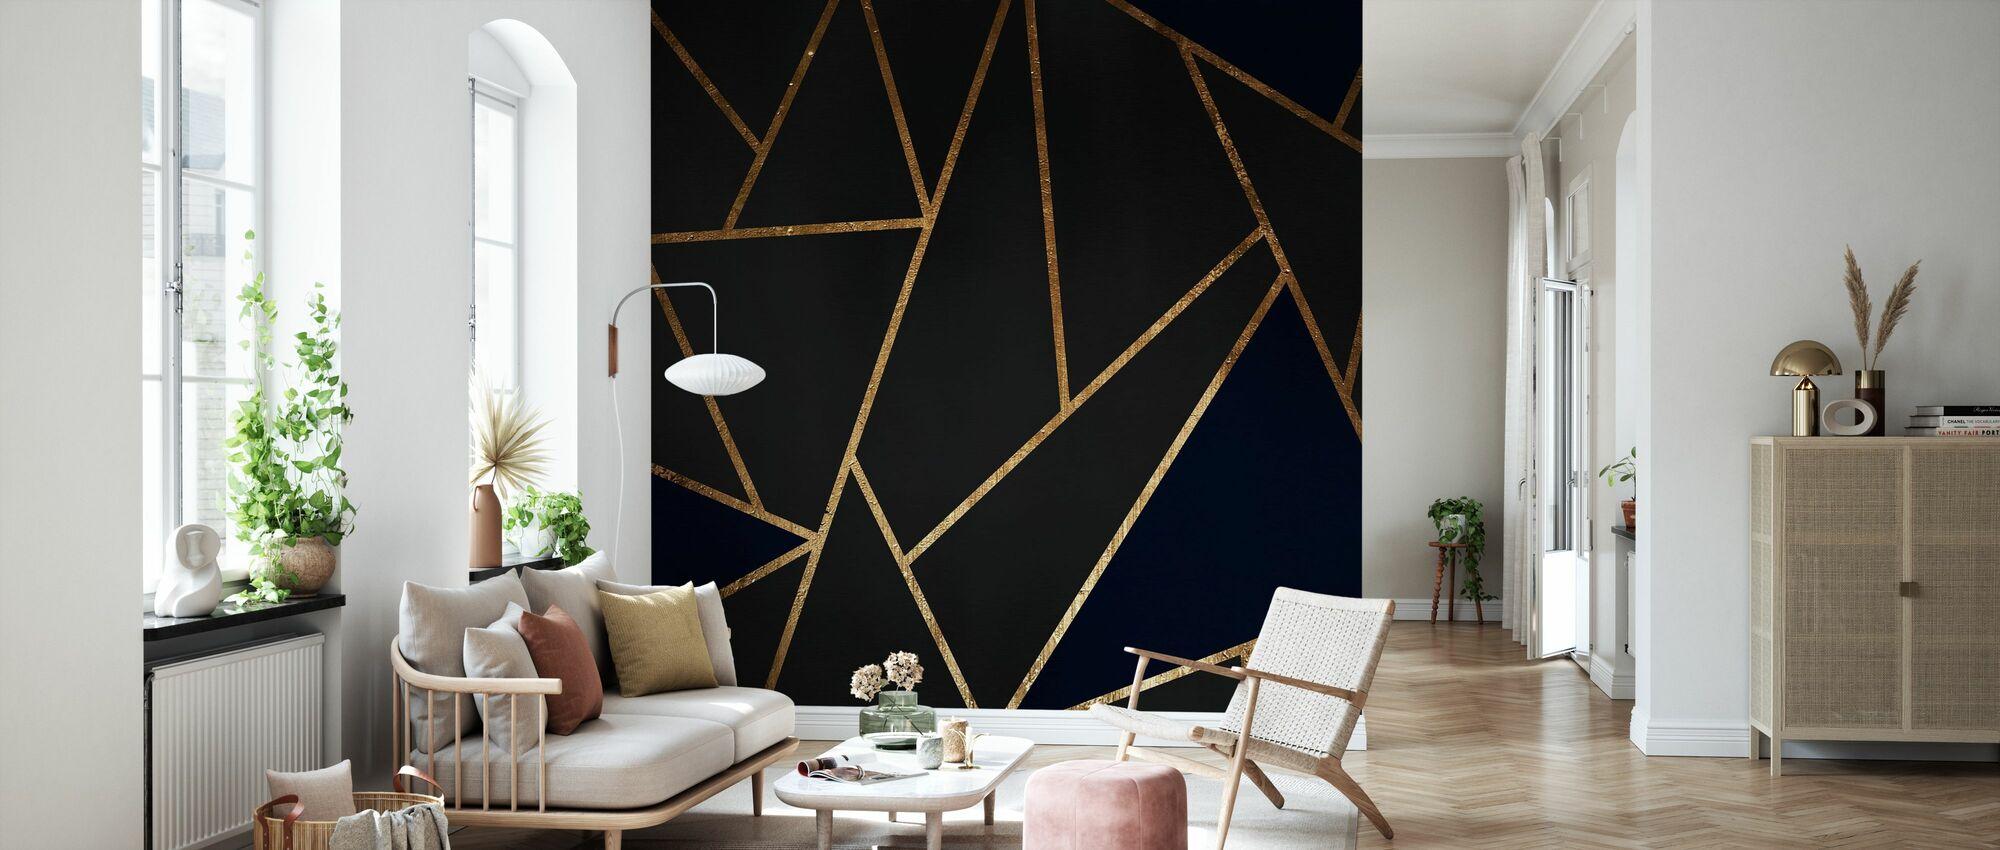 Pyramids - Wallpaper - Living Room